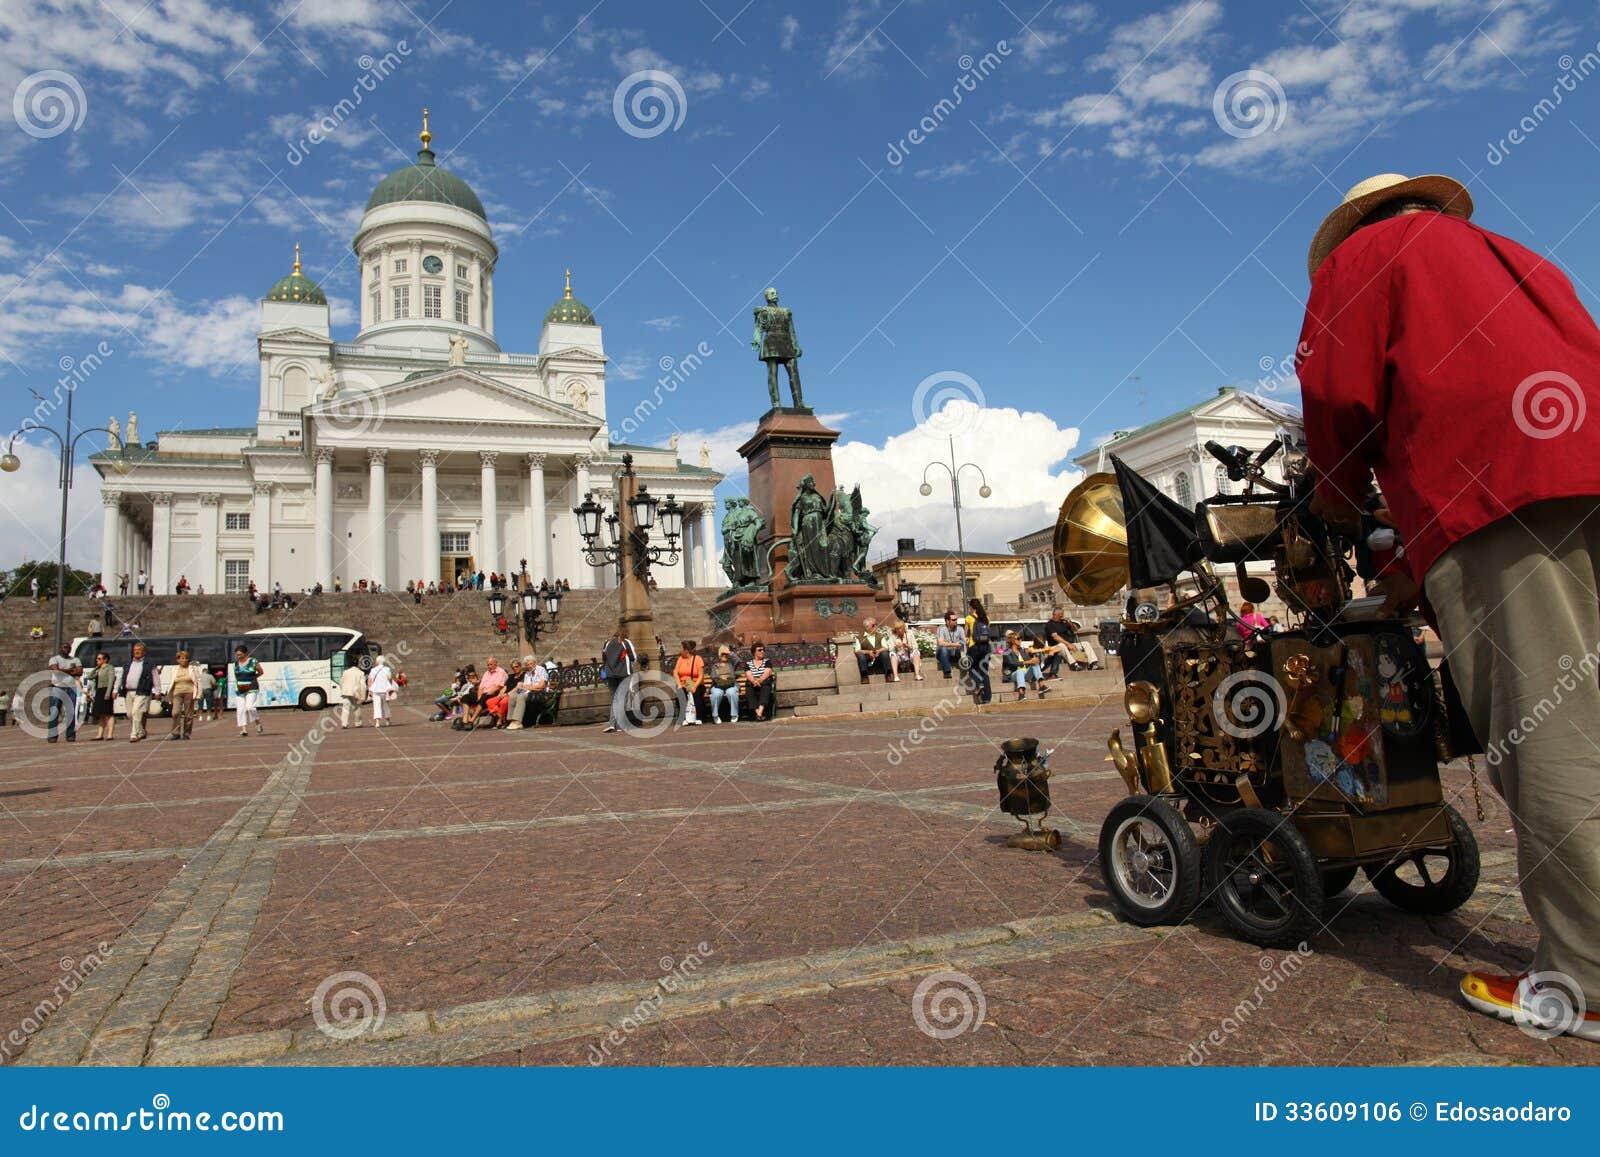 helsinki city entertainment editorial photo